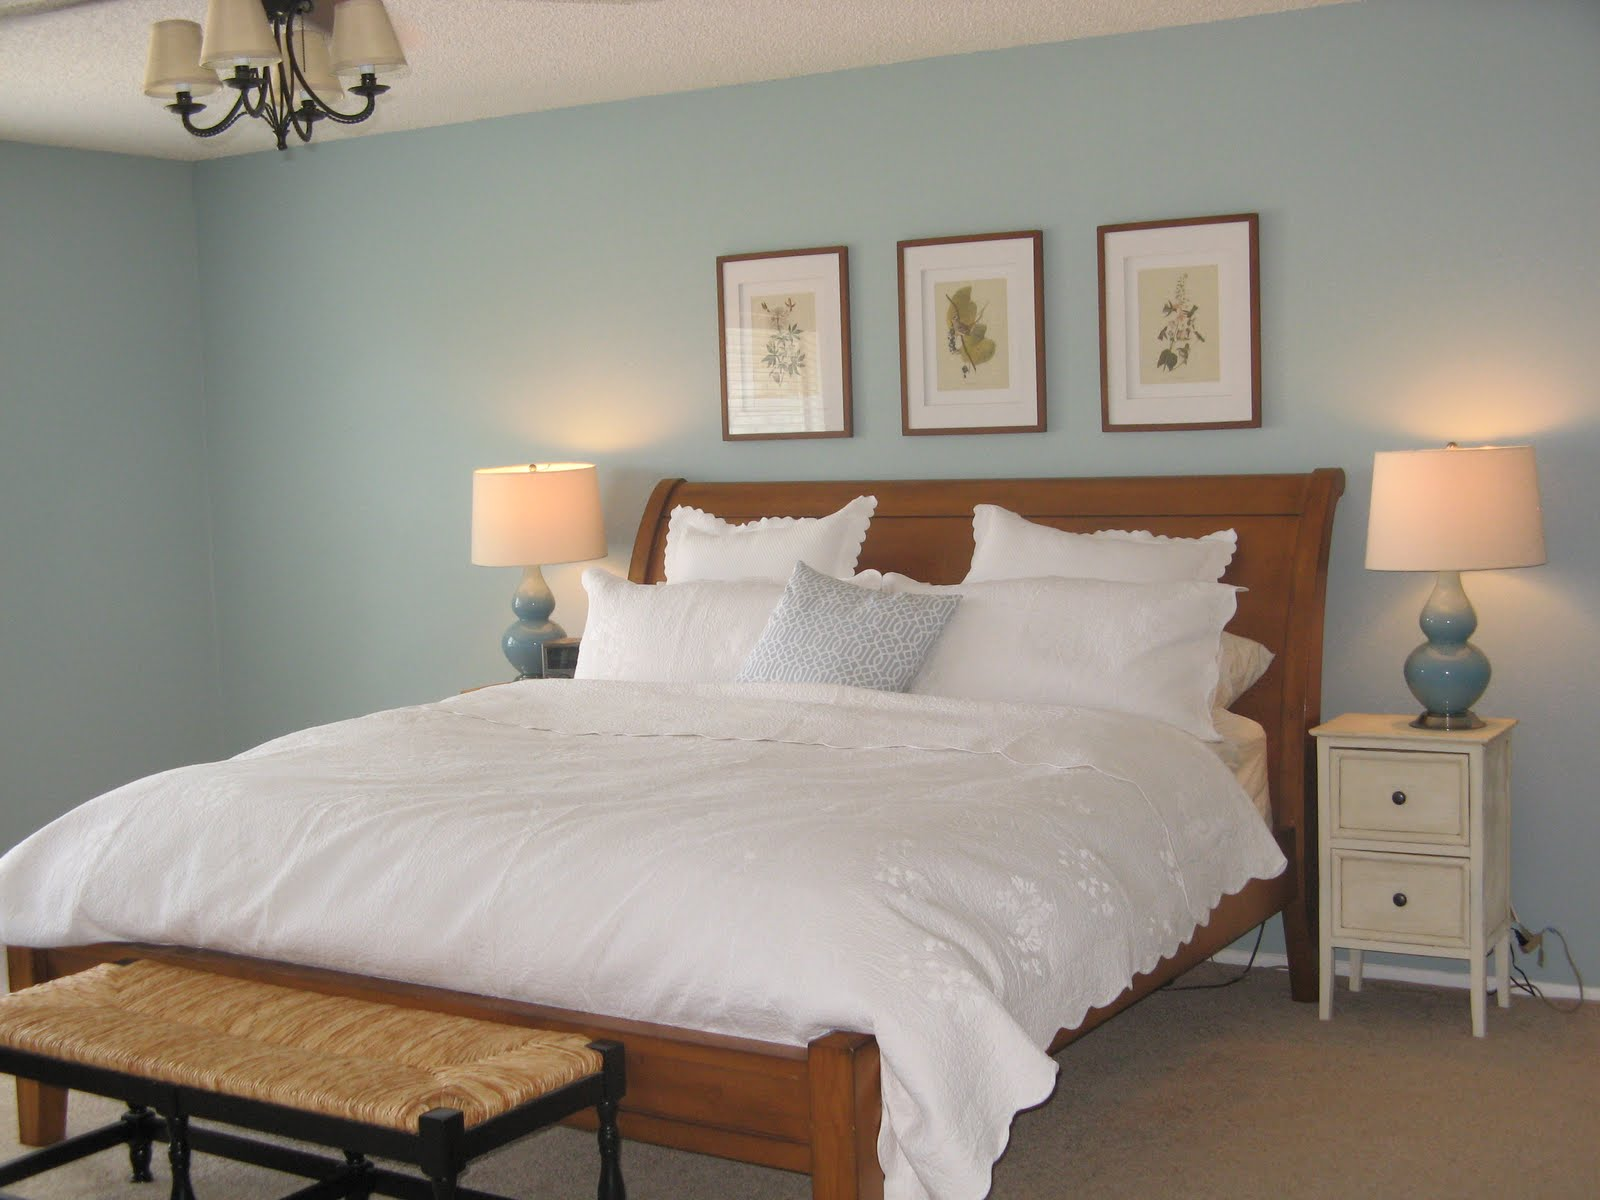 Benjamin Moore Seafoam Blue Living Room | Car Interior Design